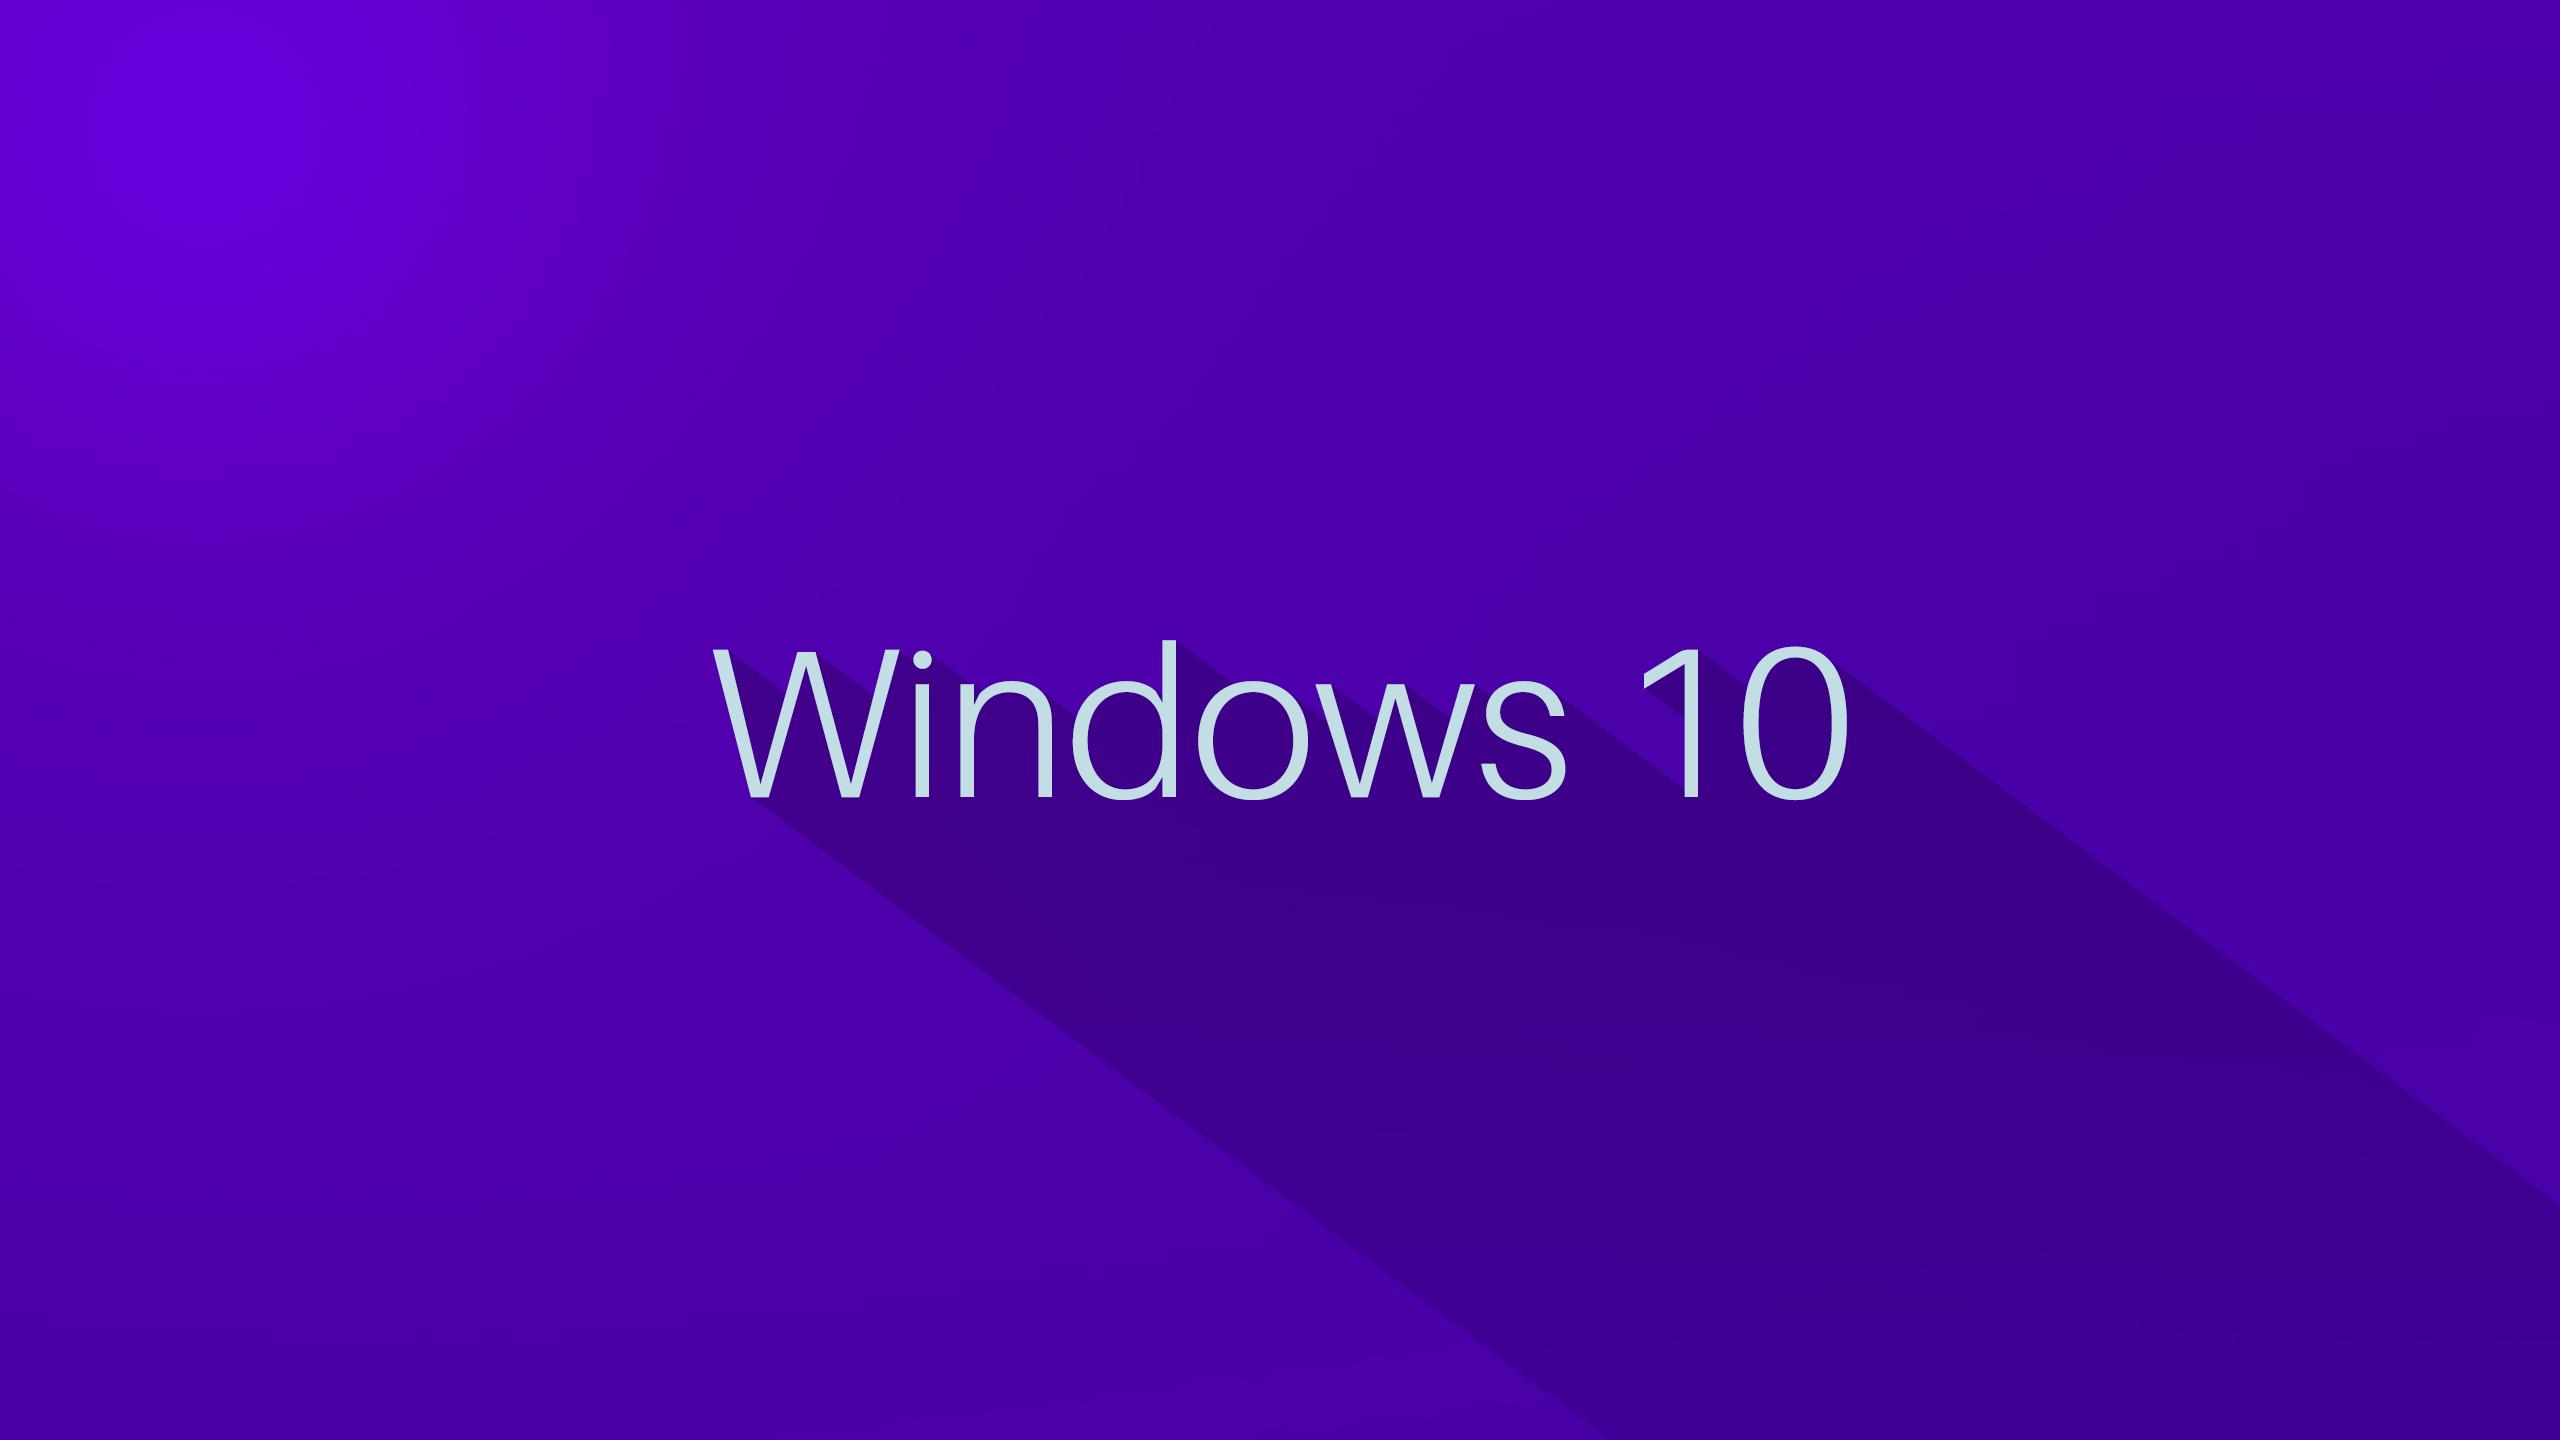 free microsoft desktop backgrounds 2560x1440